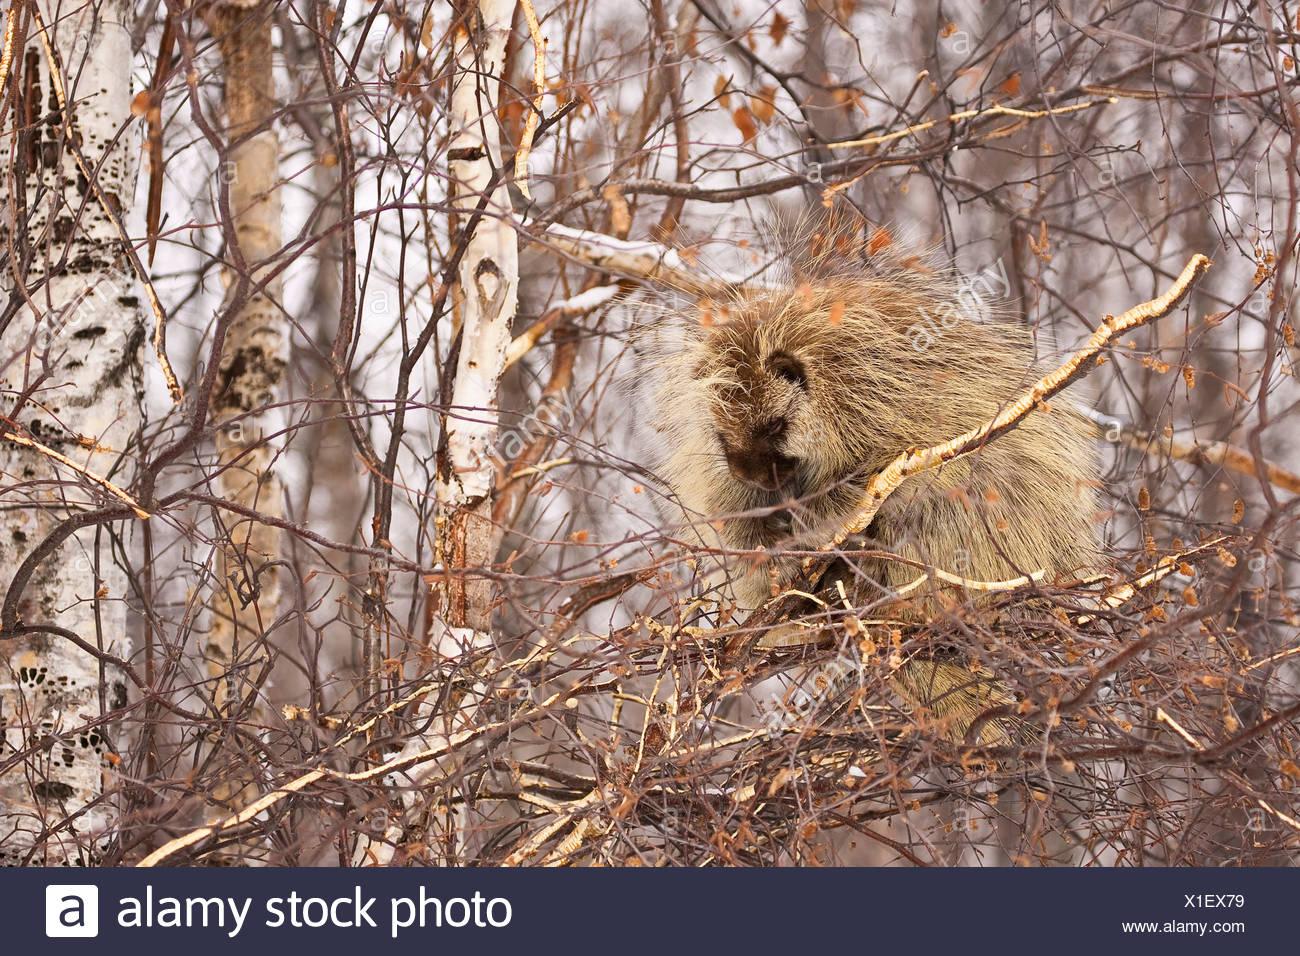 North American Porcupine (Erethizon dorsatum) sleeping in tree in Elk Island National Park, Alberta, Canada. Stock Photo